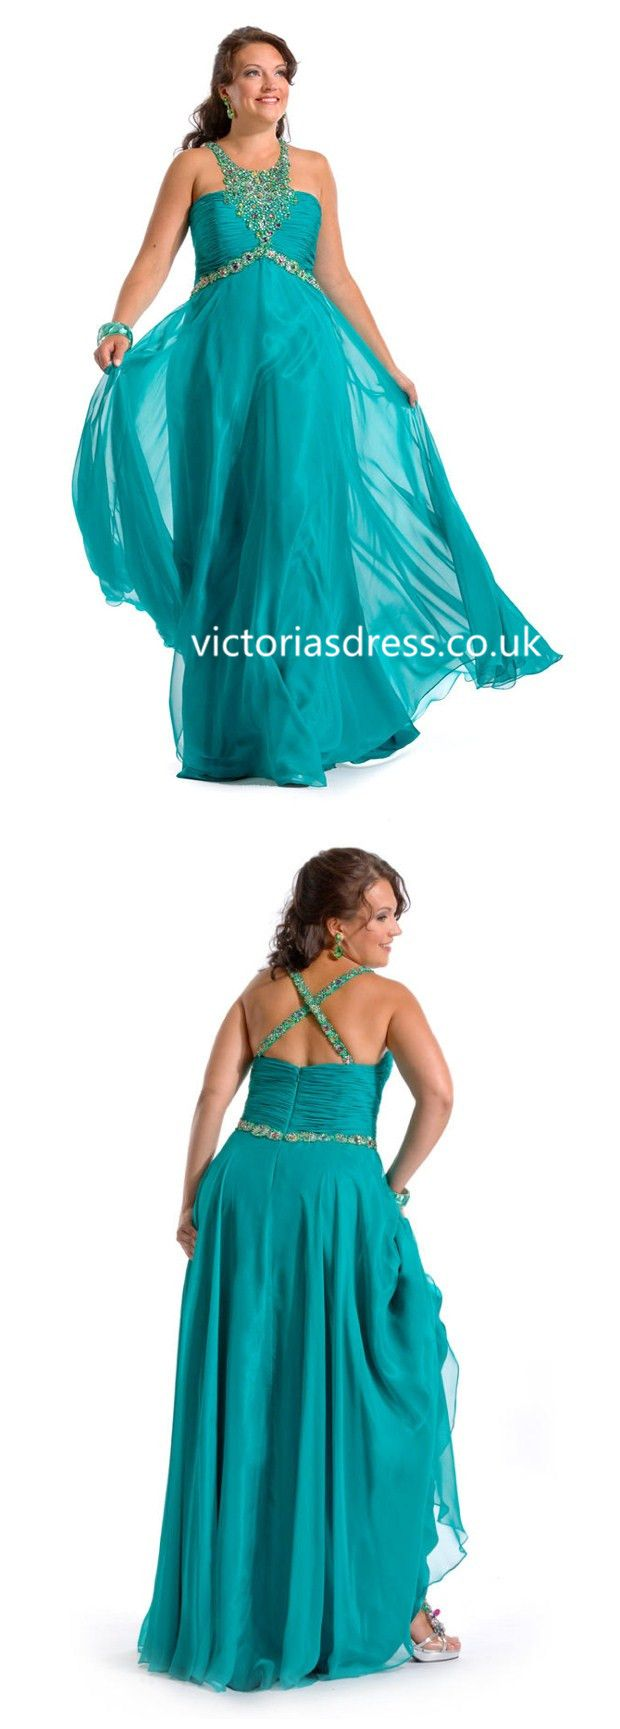 65 best Plus Size Prom Dresses images on Pinterest | Party wear ...